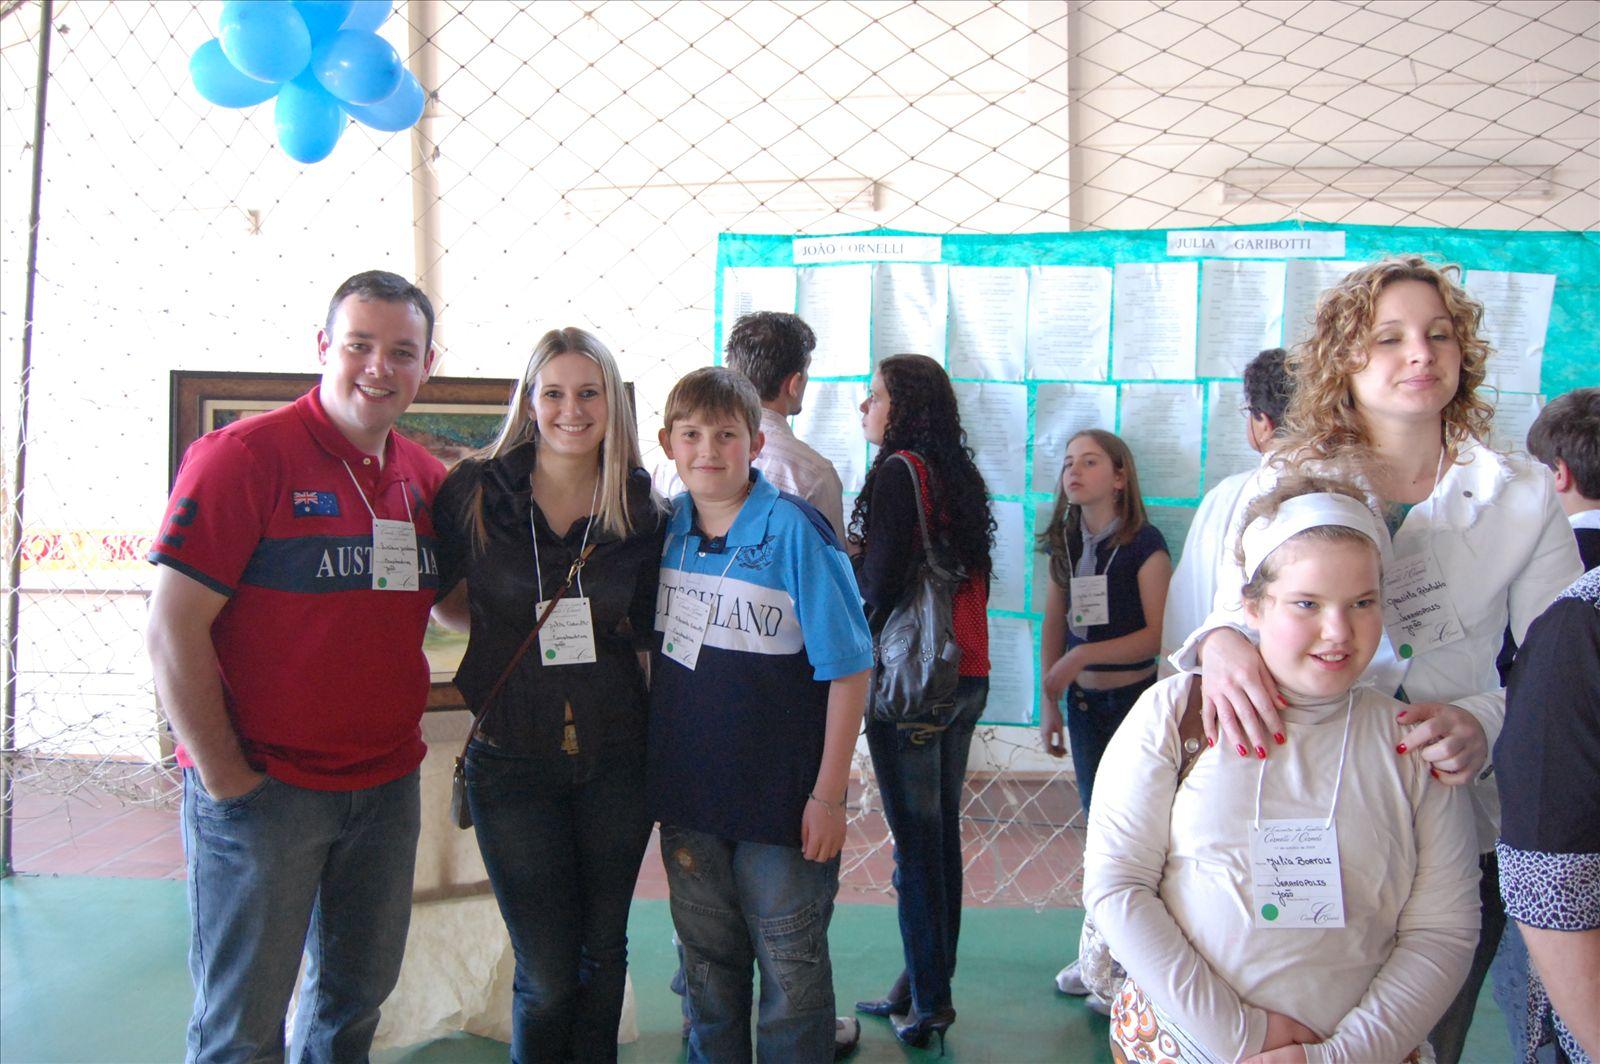 2º Encontro Família Cornelli - 11.10.2009 (33)_0